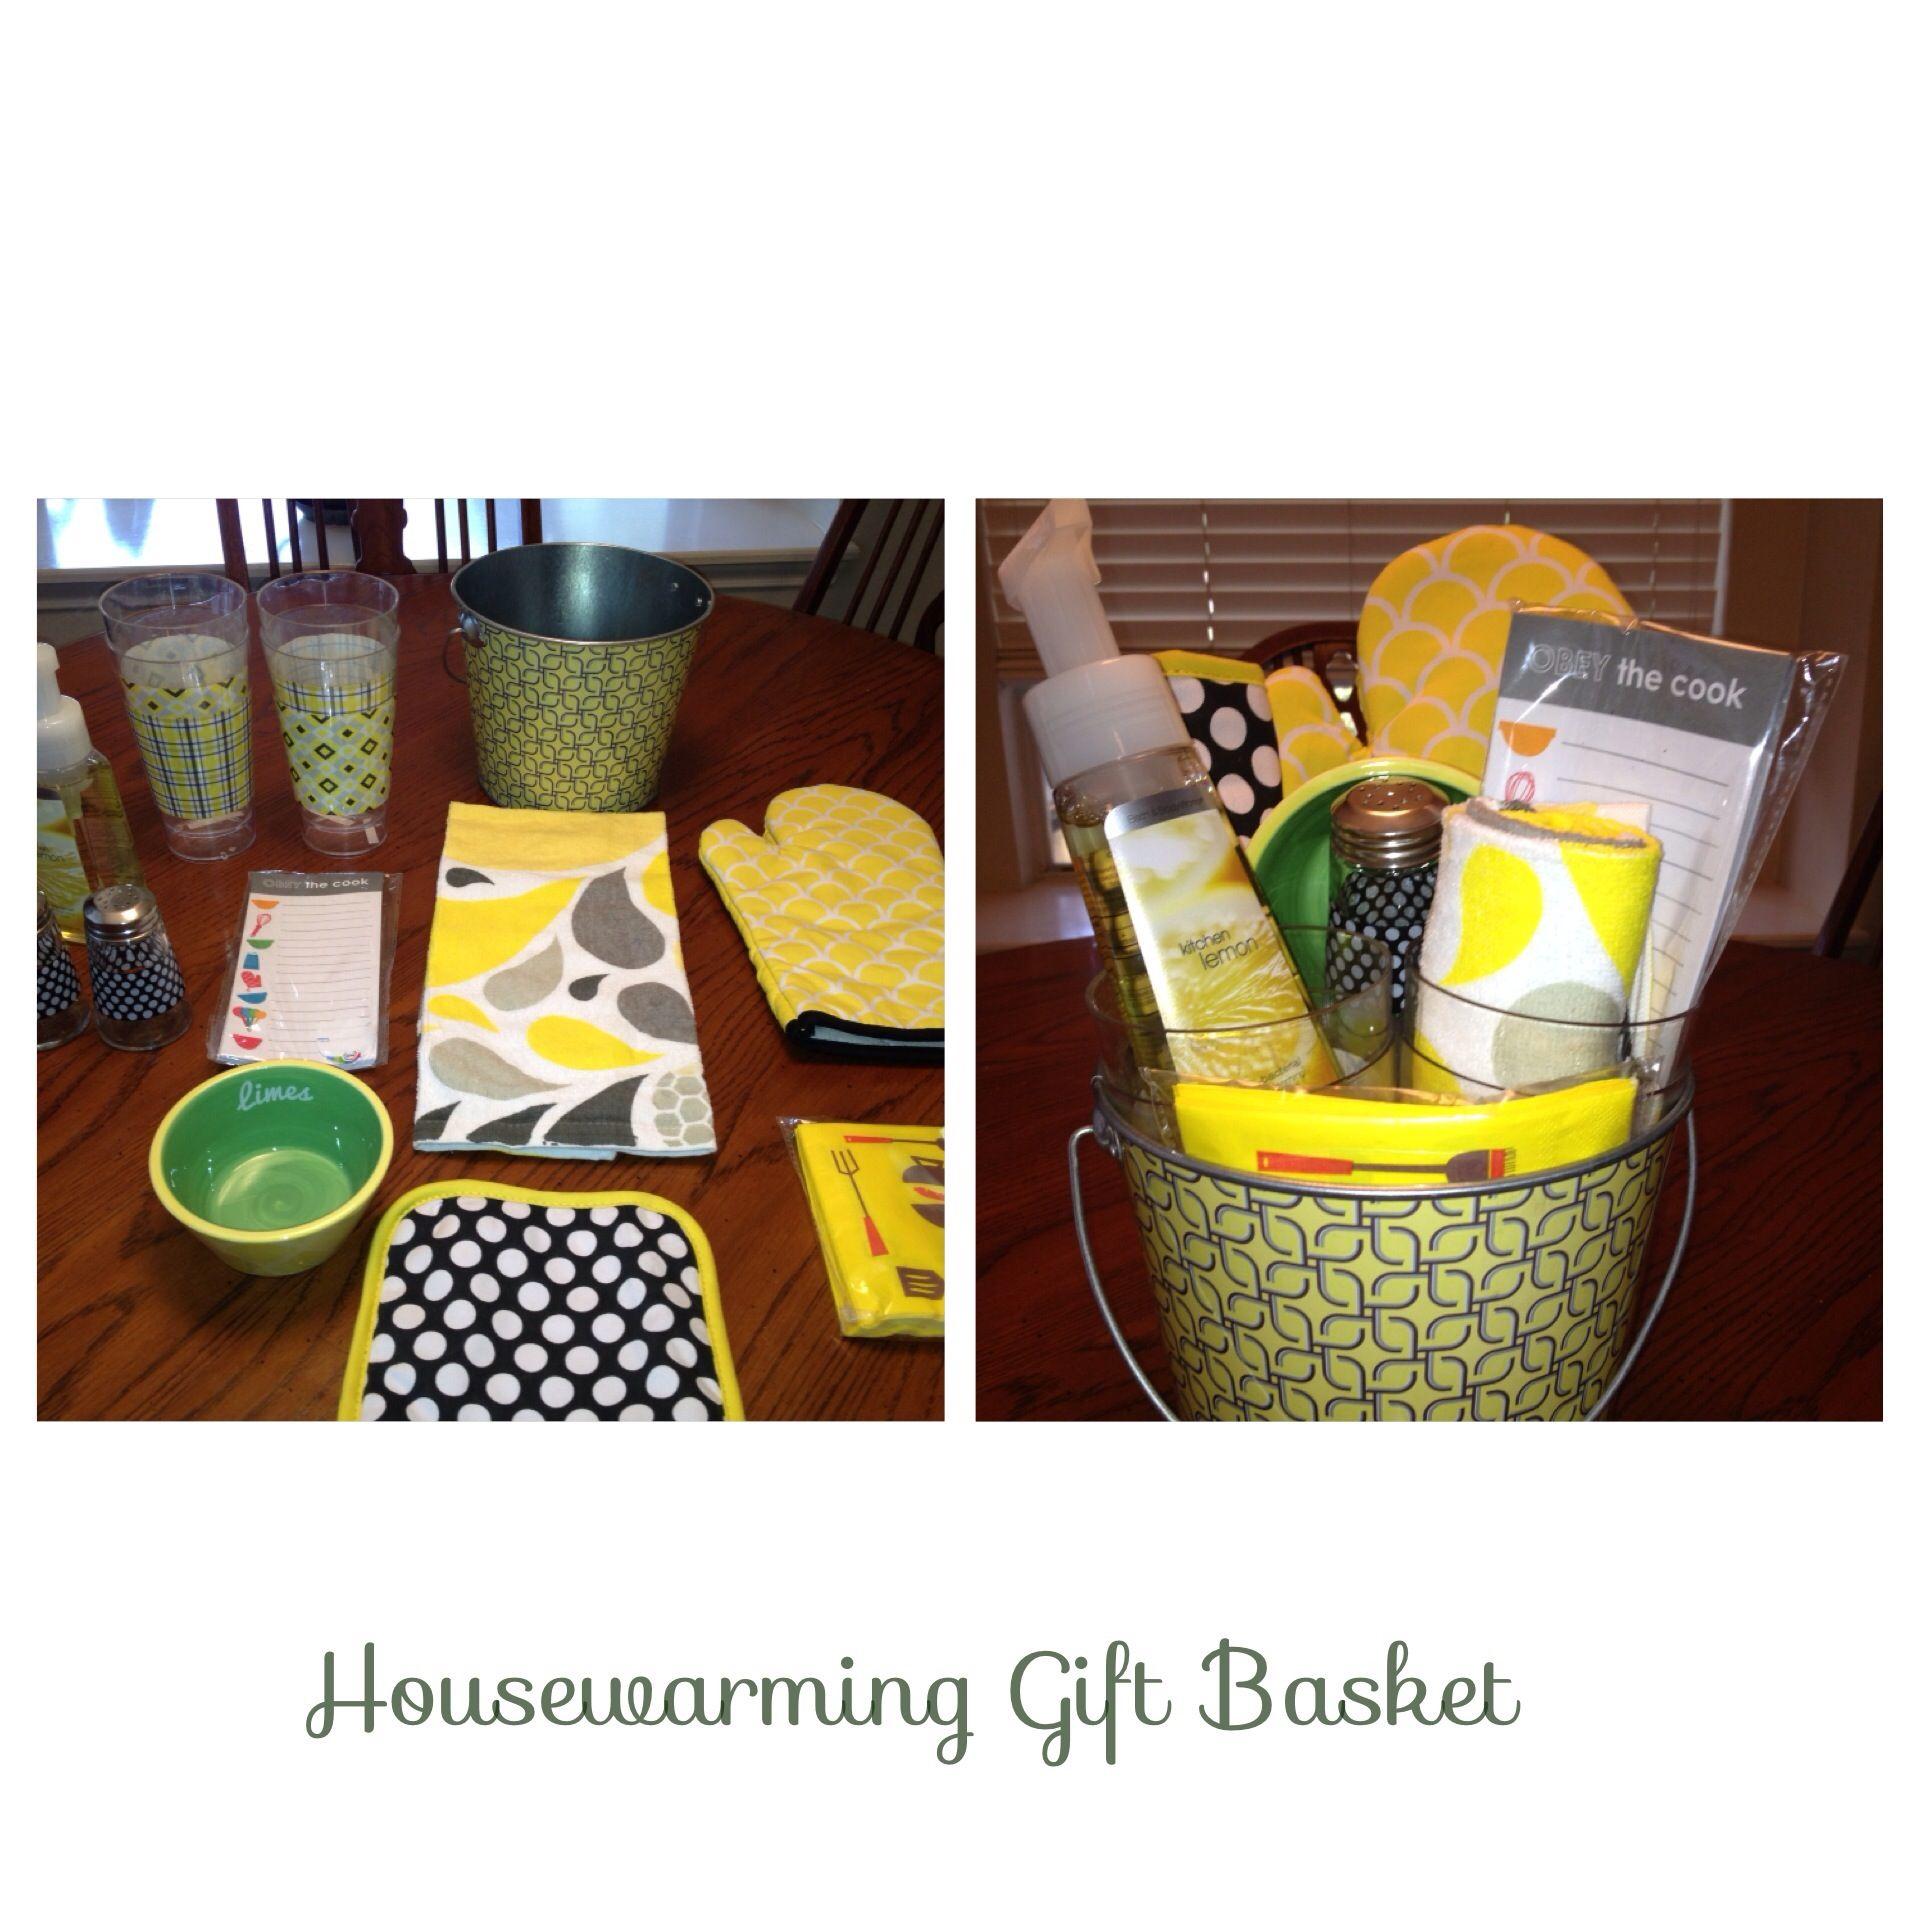 Housewarming gift basket via hobby lobby target bath